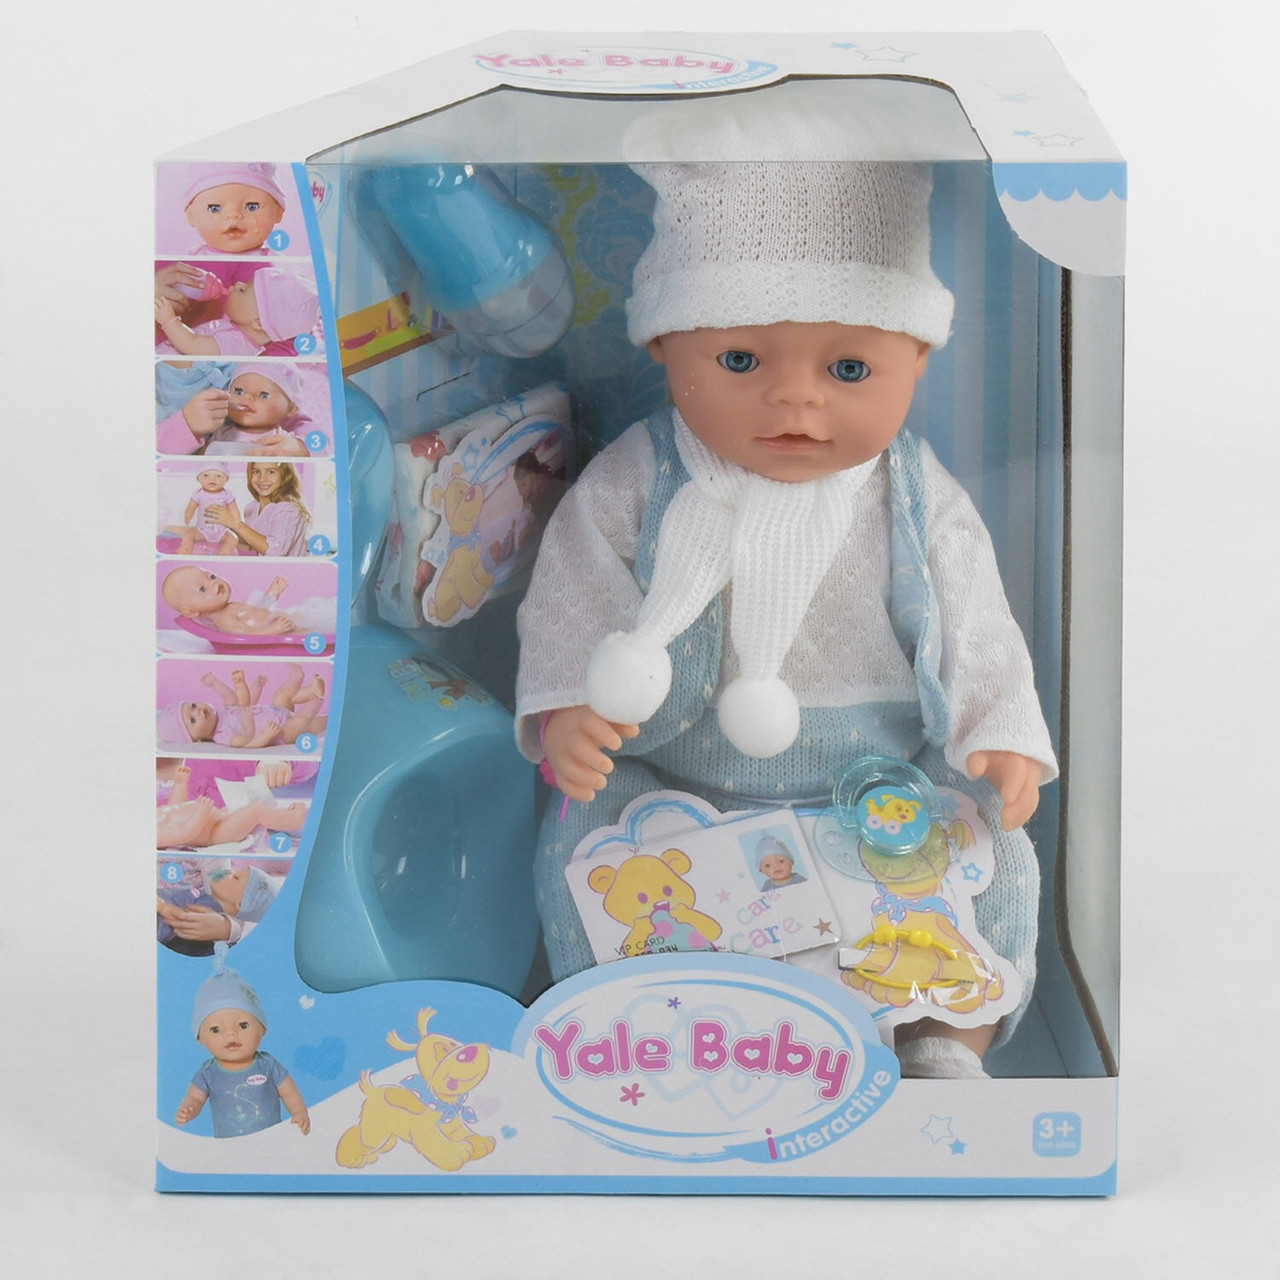 Пупс функциональный BL 030 B с аксессуарами 8 функций в коробке / кукла для дівчинки